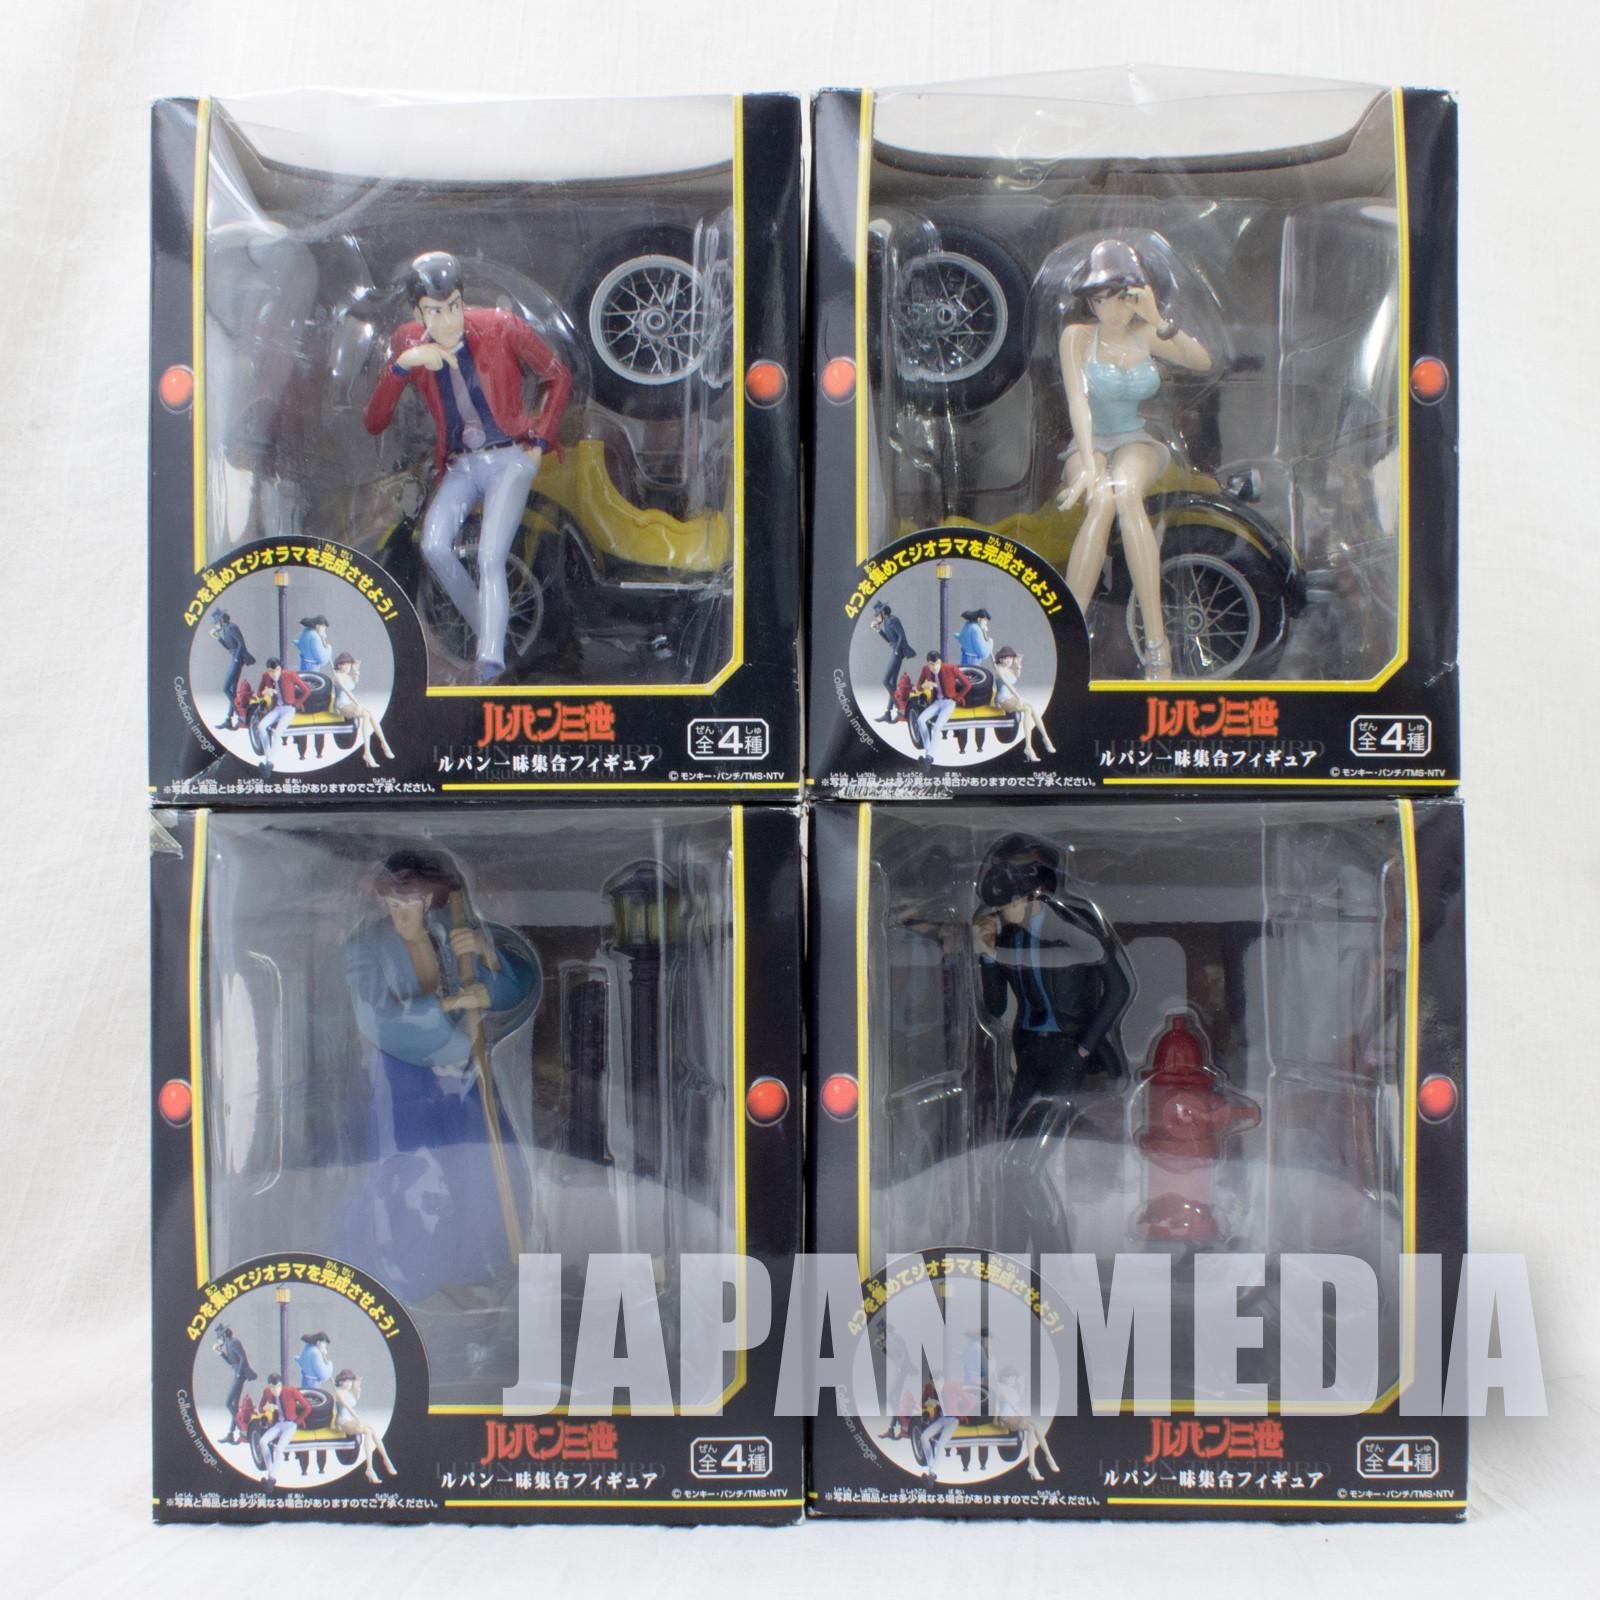 Lupin the Third (3rd) Lupin Family Figure Complete set [Lupin / Jigen / Goemon / Fujiko] Banpresto